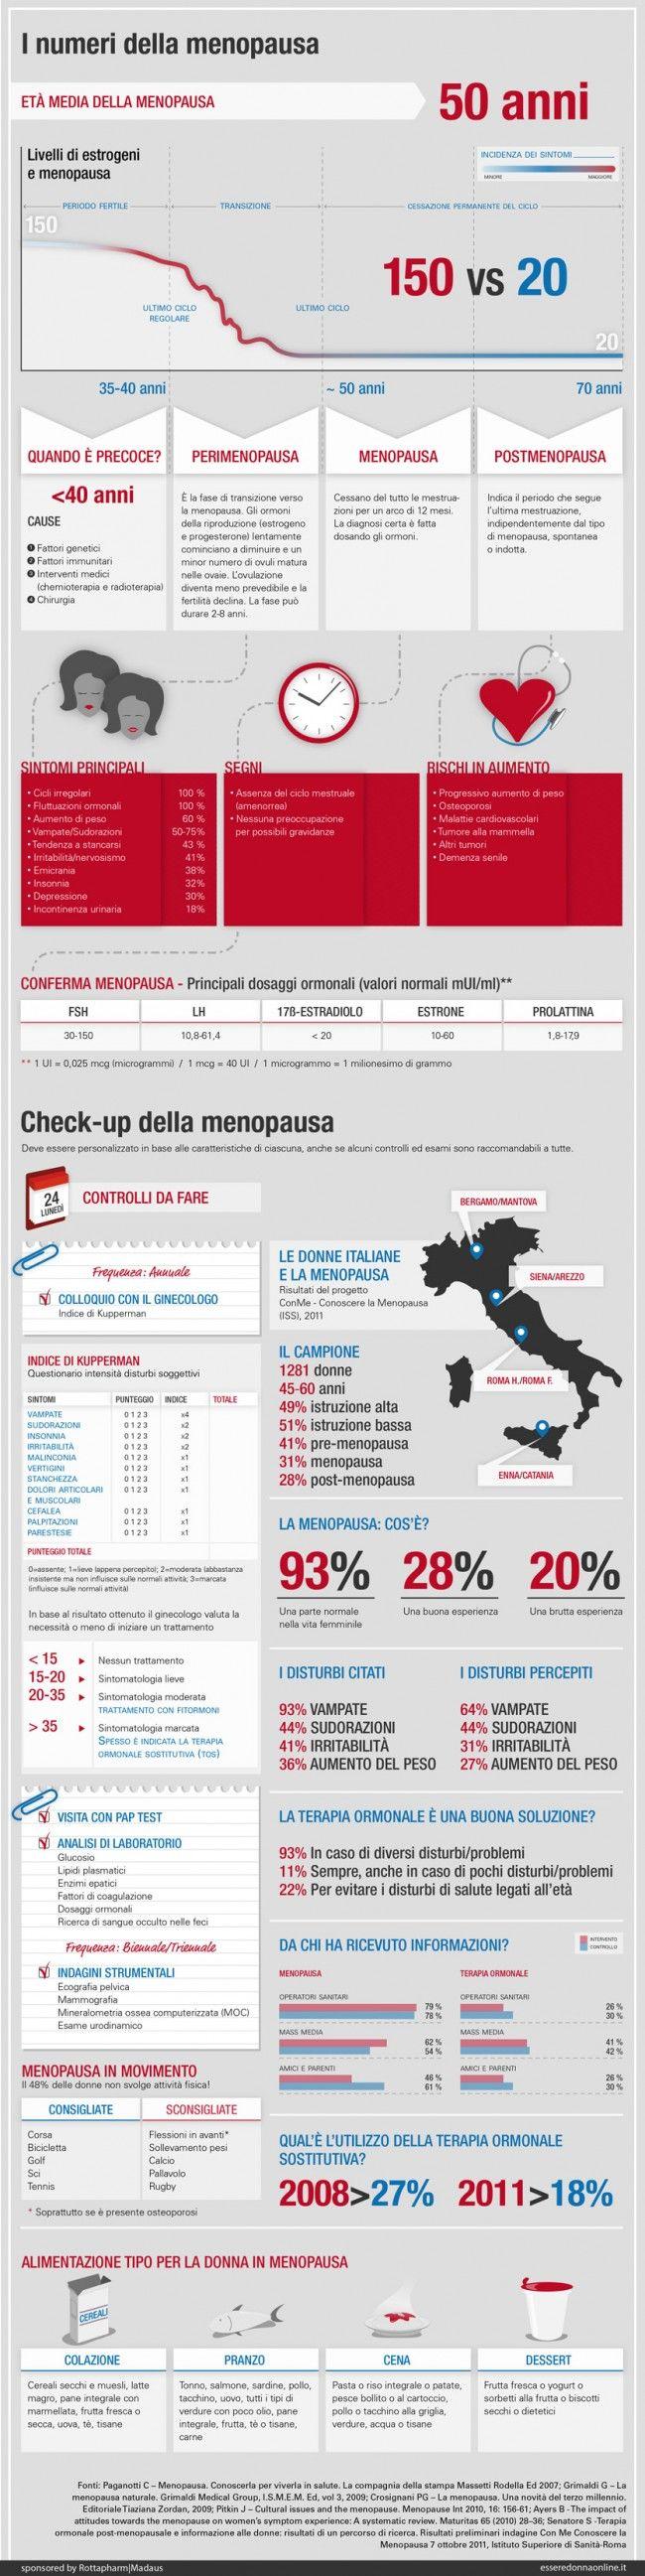 I numeri delma menopausa - Esseredonnaonline